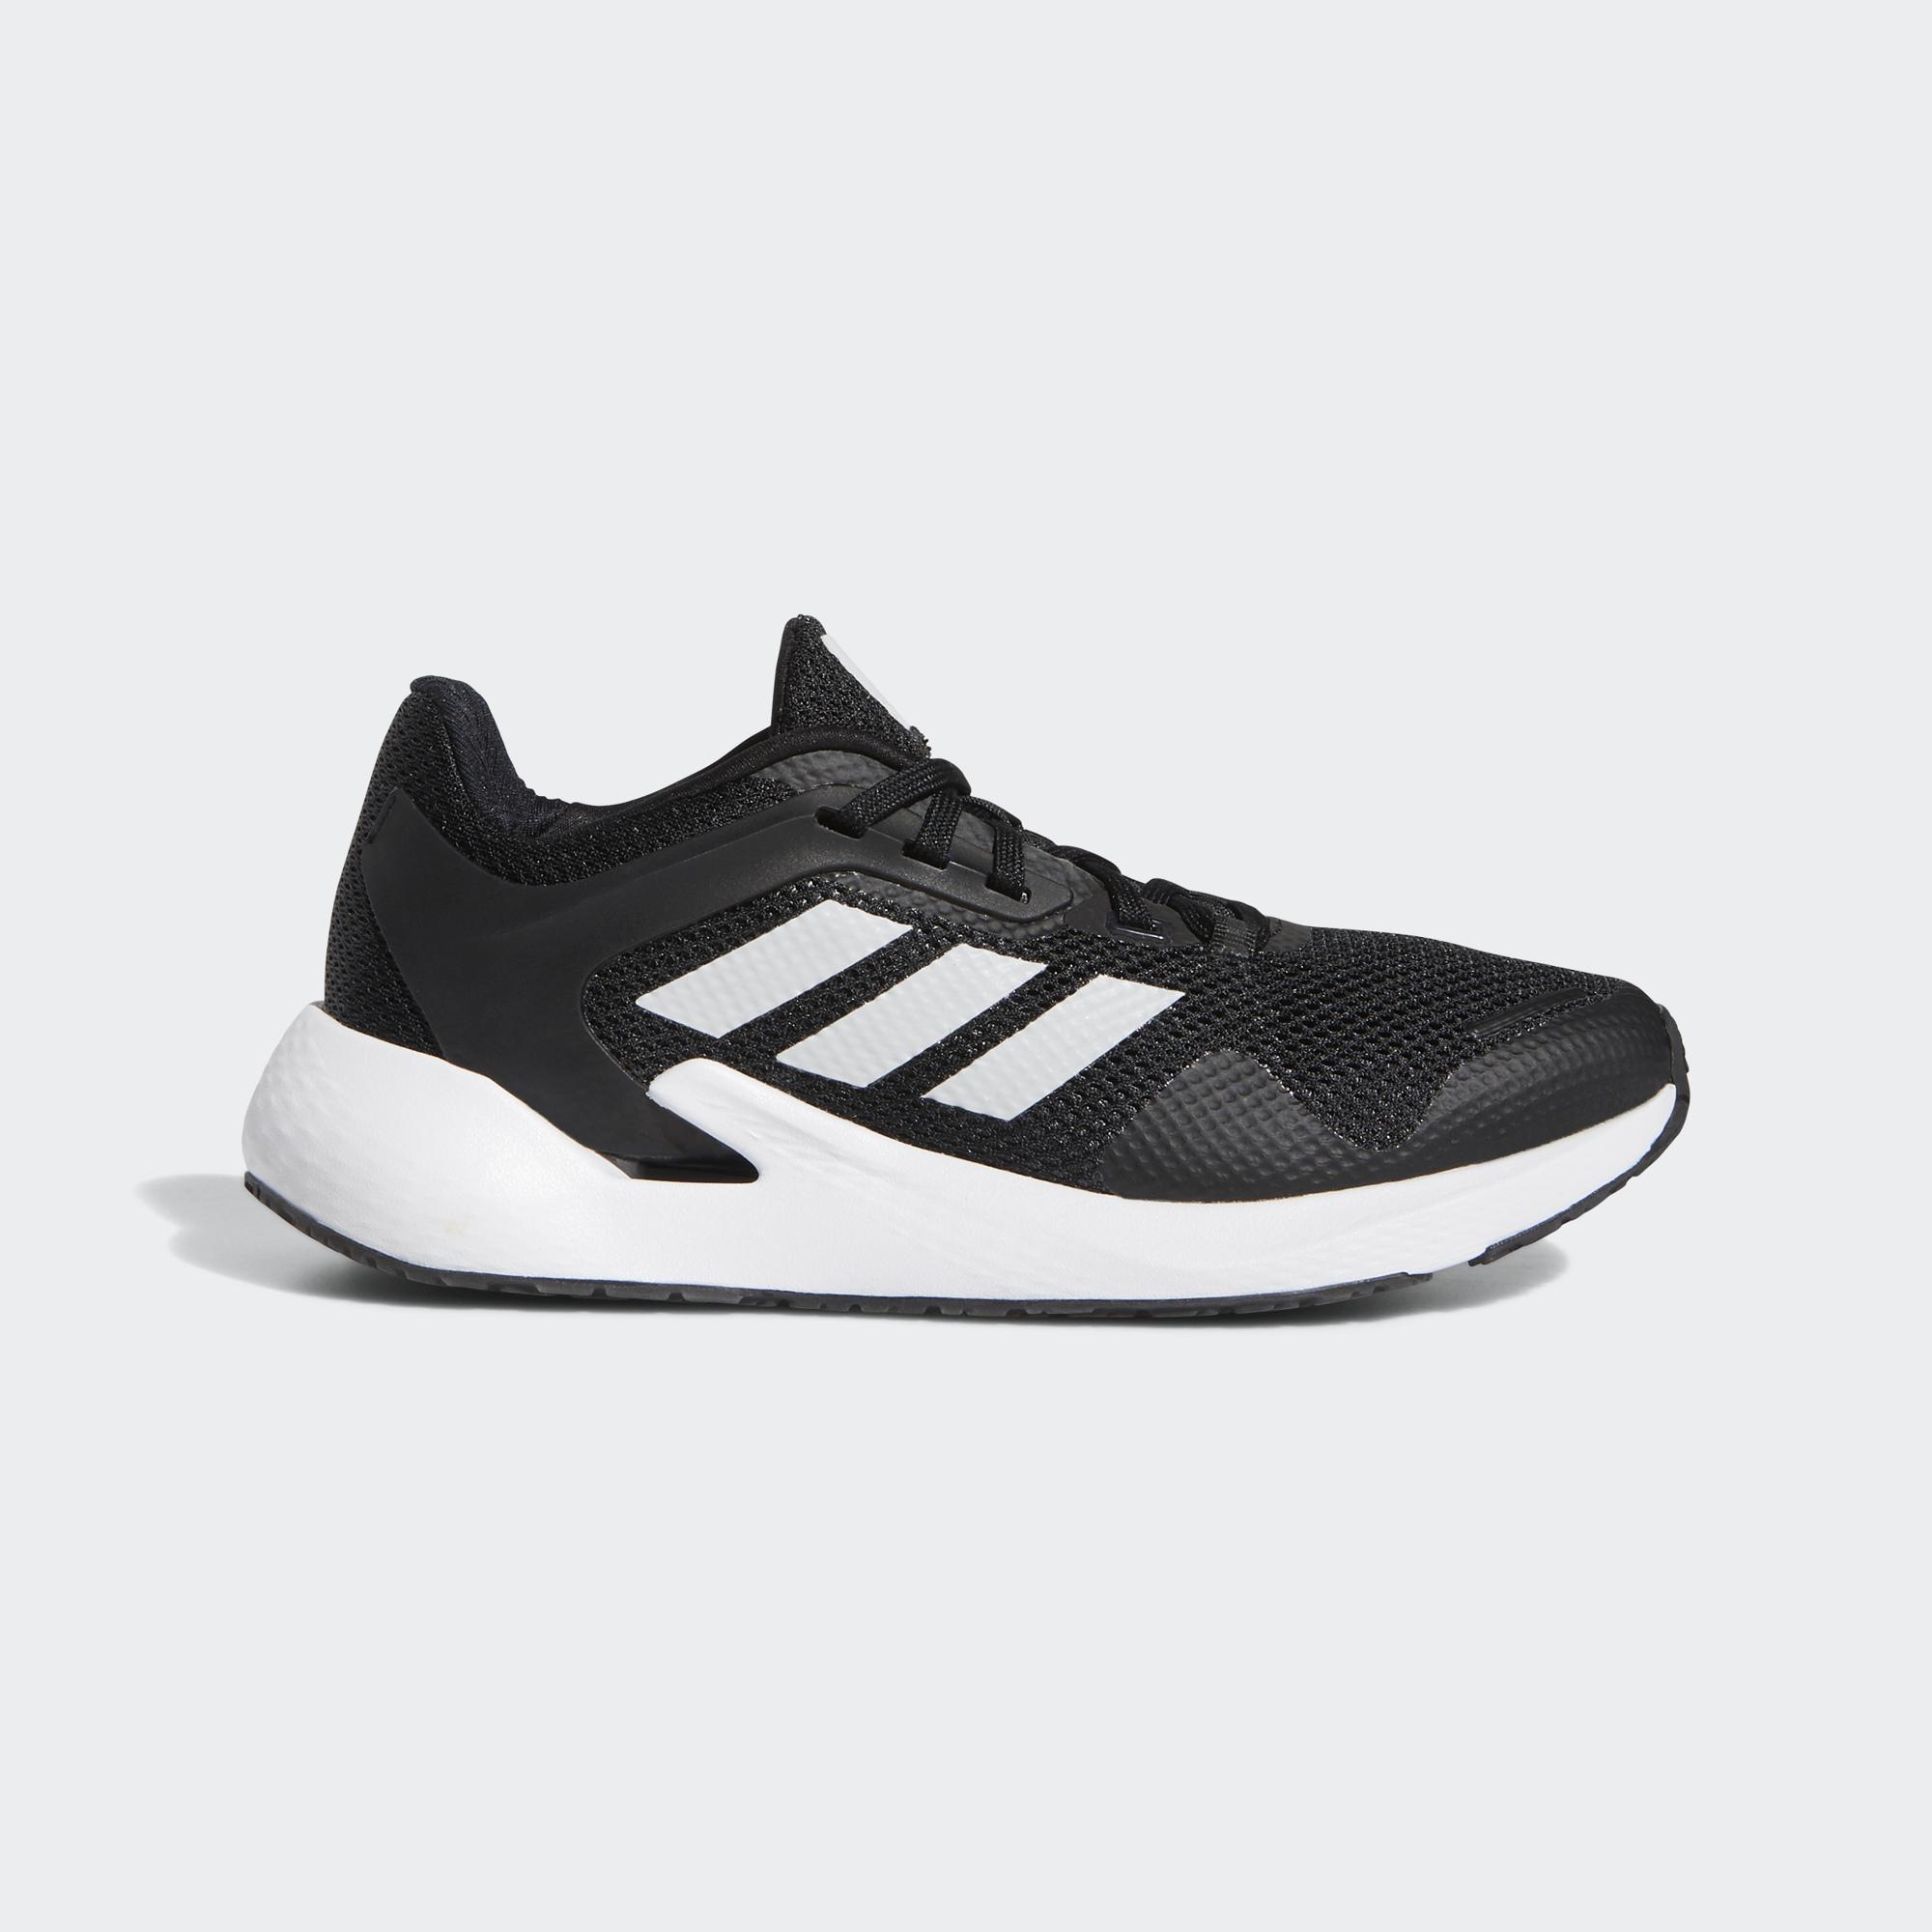 Alphatorsion 360 跑鞋